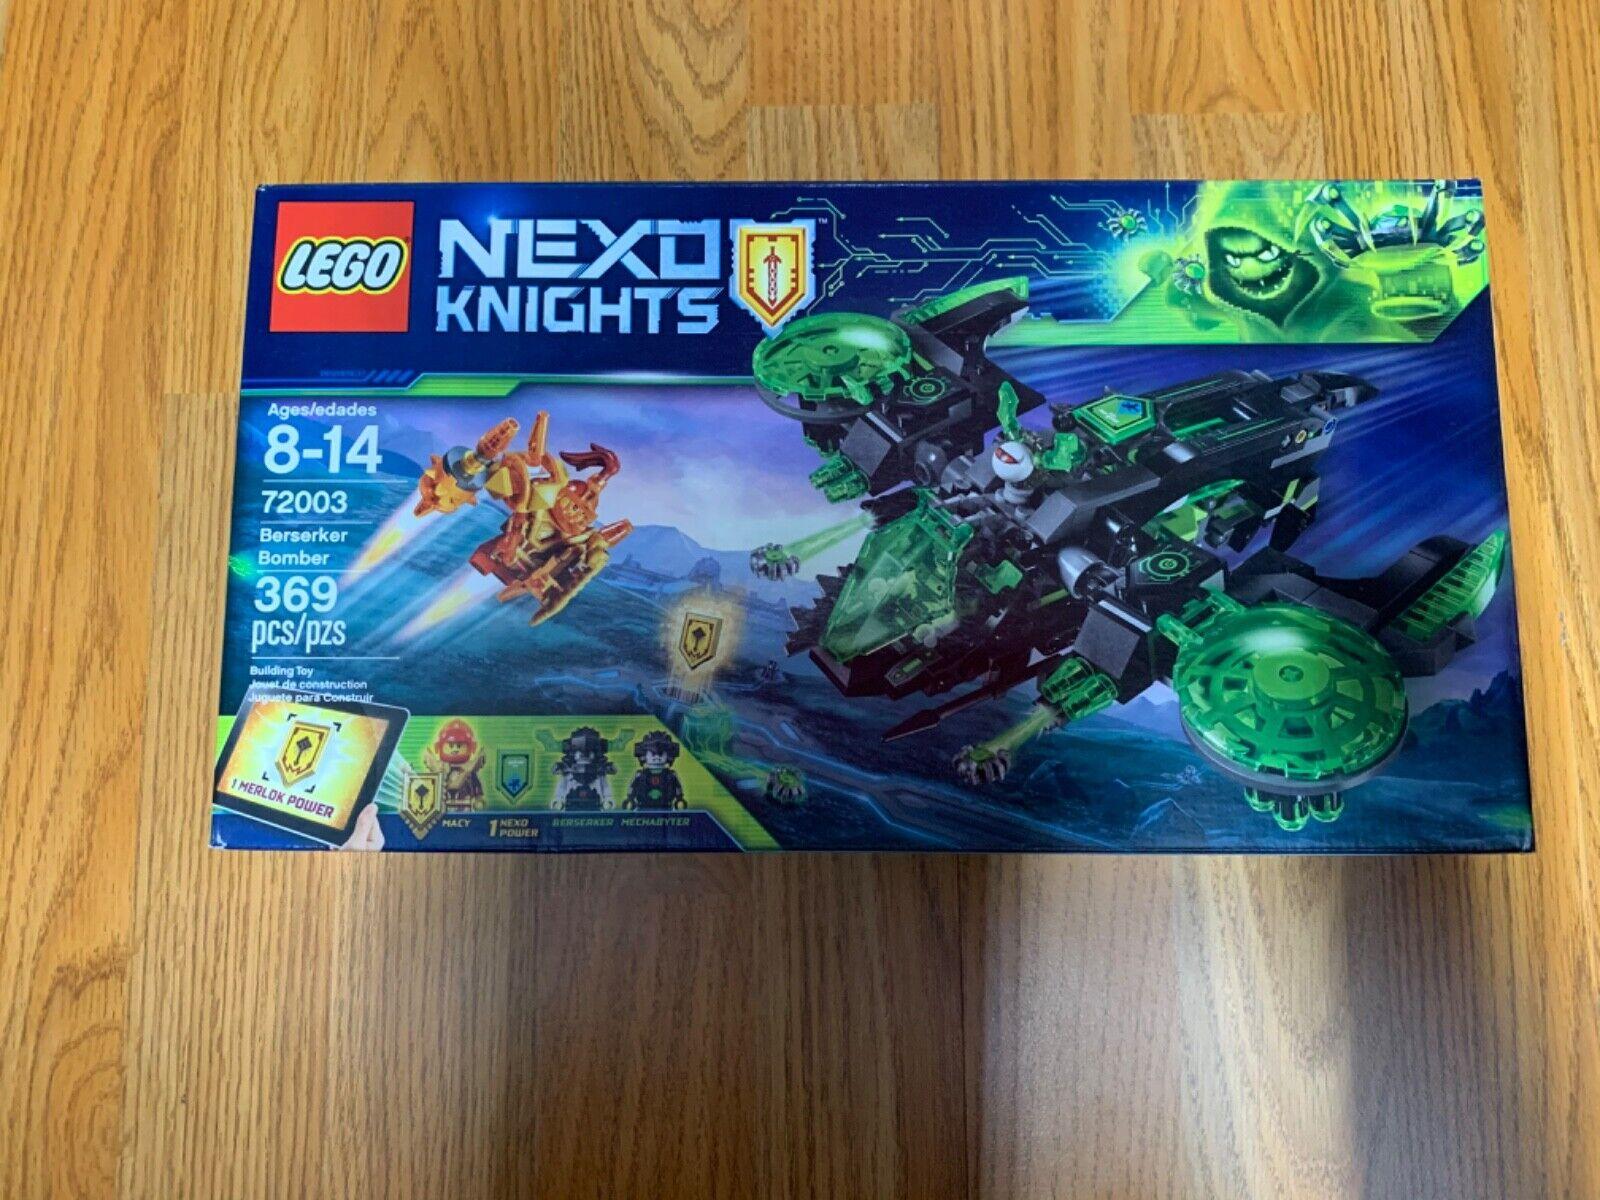 72003 BERSERKER BOMBER lego castle NEW legos set NEXO KNIGHTS macy mechabyter